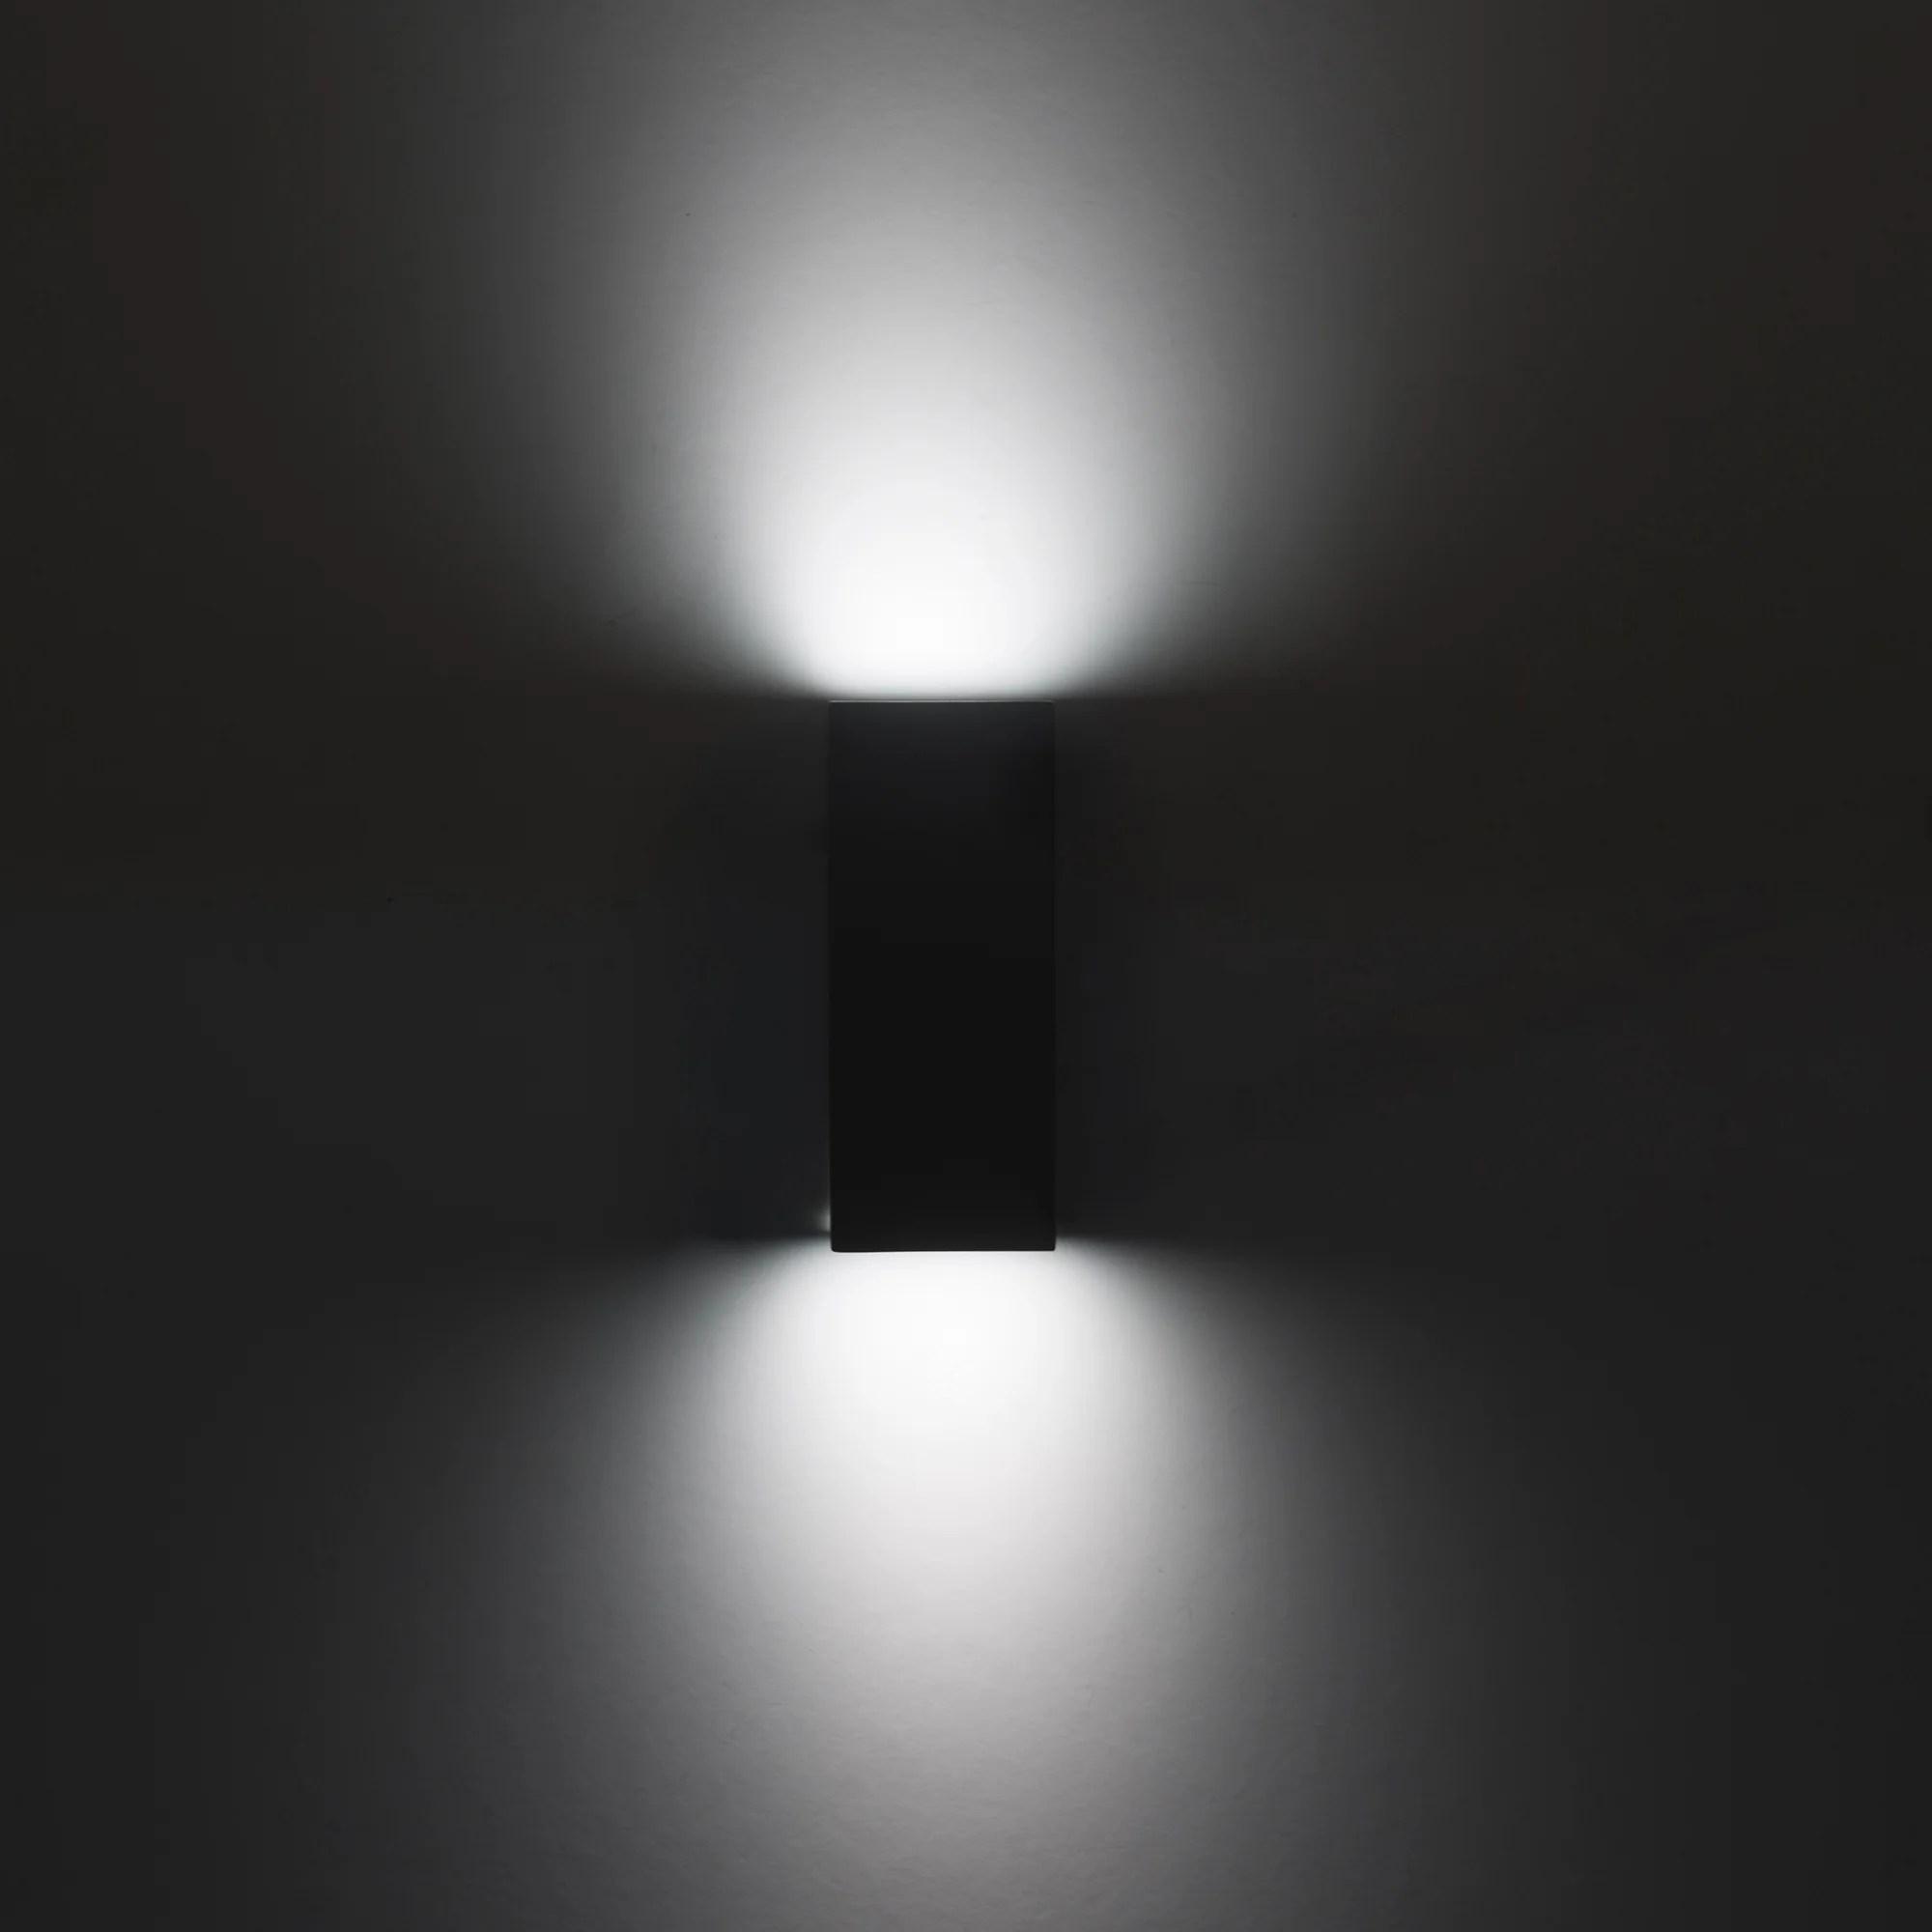 Applique Exterieur Gu10 Max 35w Noir Cube Acier Forlight Leroy Merlin